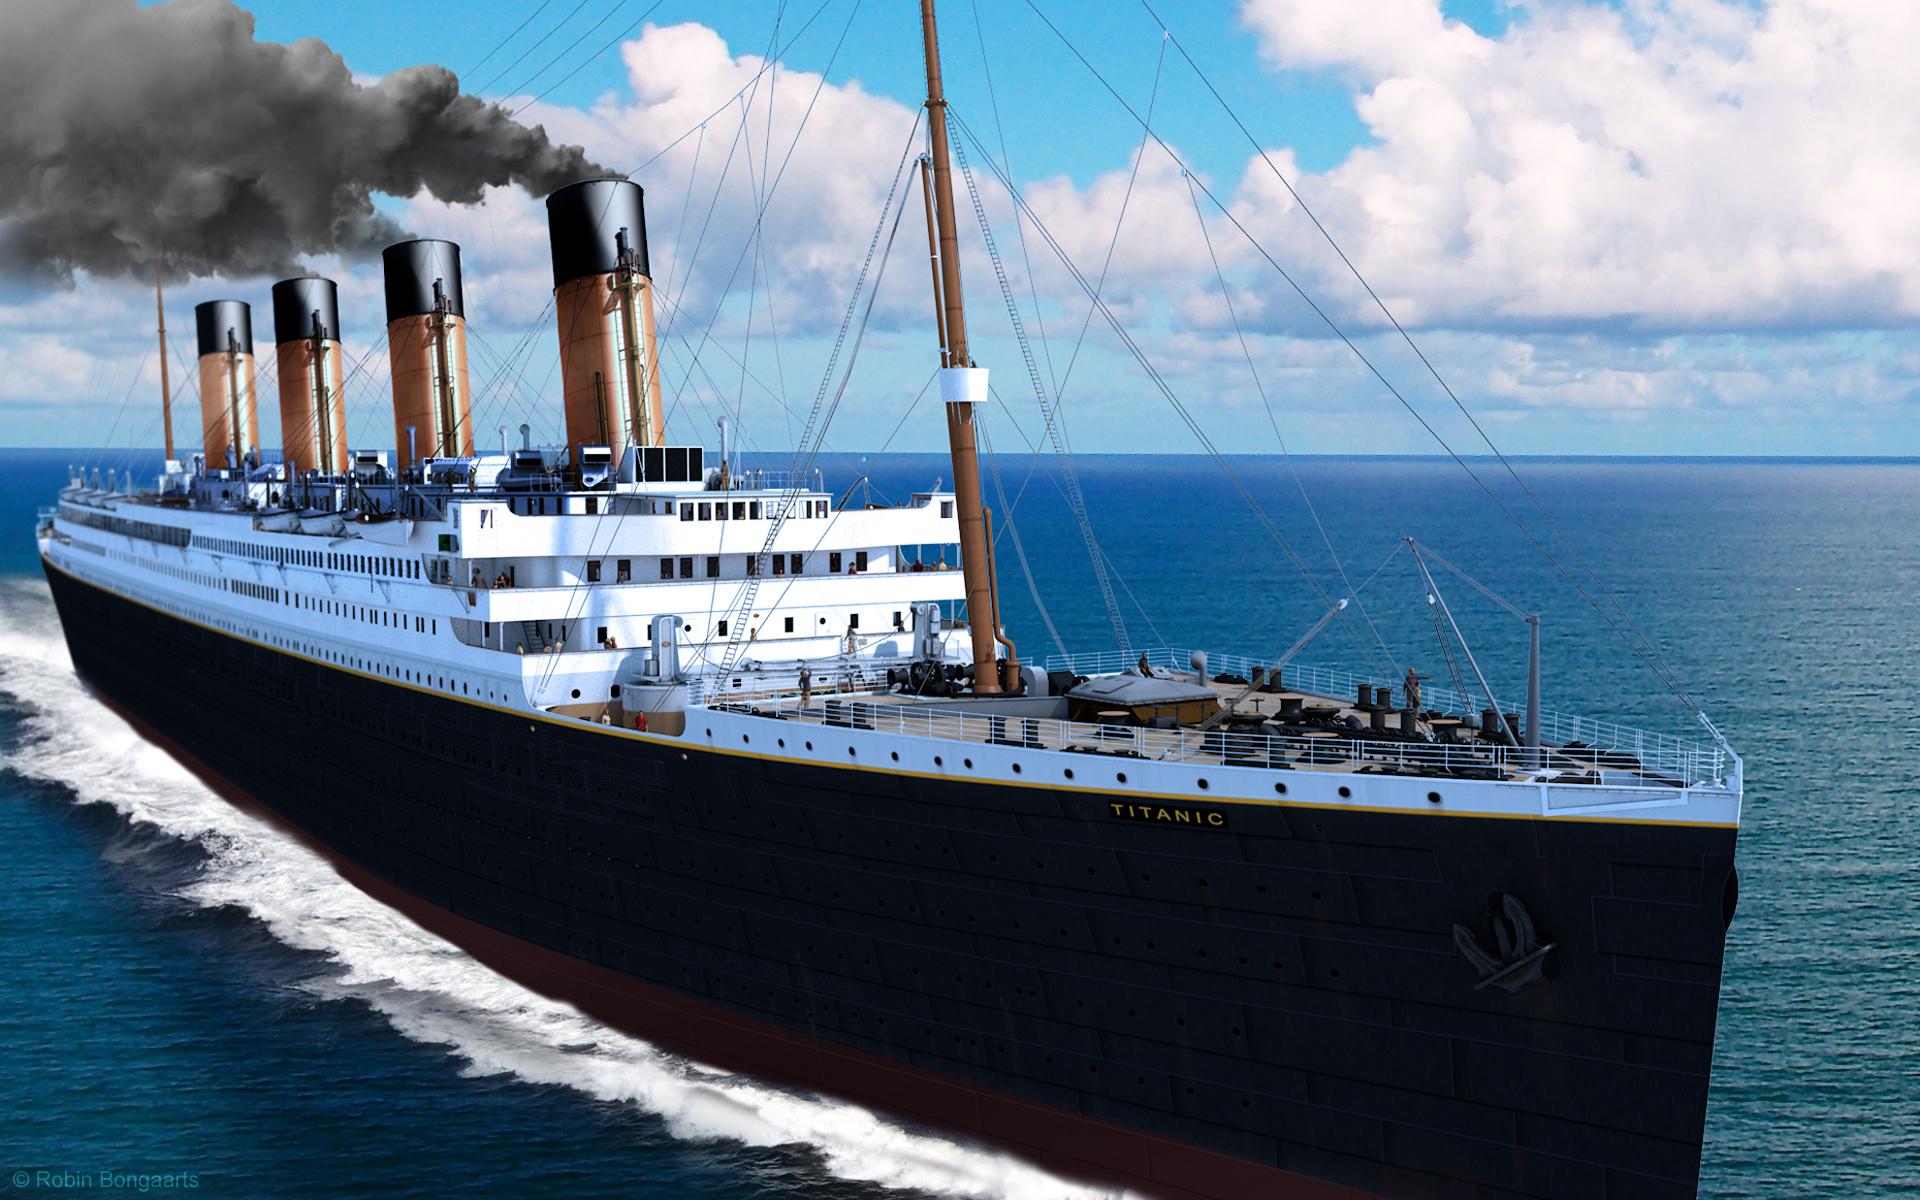 Hawkeye Hd Wallpapers Titanic Wallpaper Image Mod Db